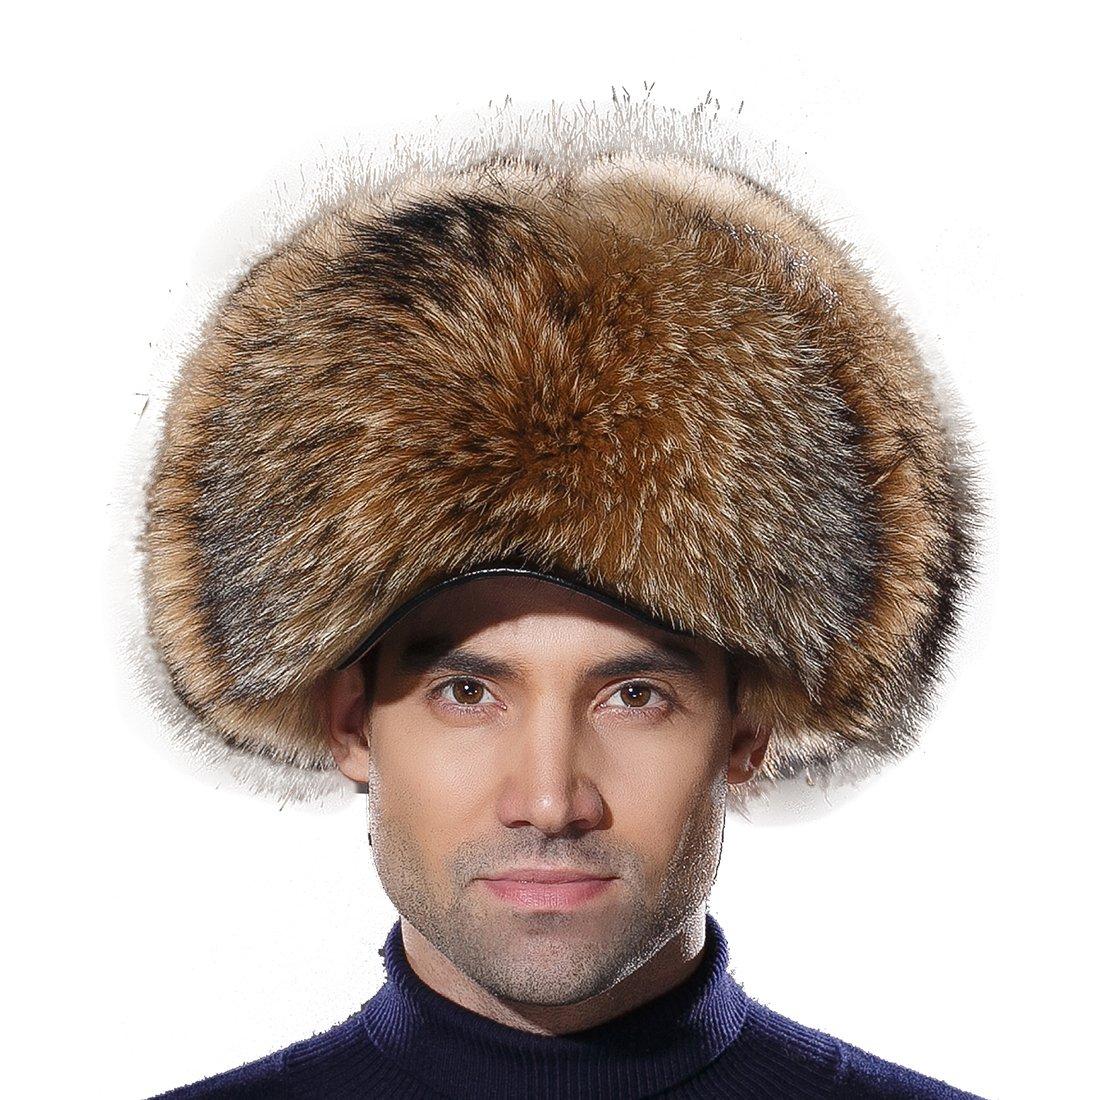 URSFUR Russian Fur Trapper Hat Leather Winter Men Real Raccoon Fur Visors Cap by URSFUR